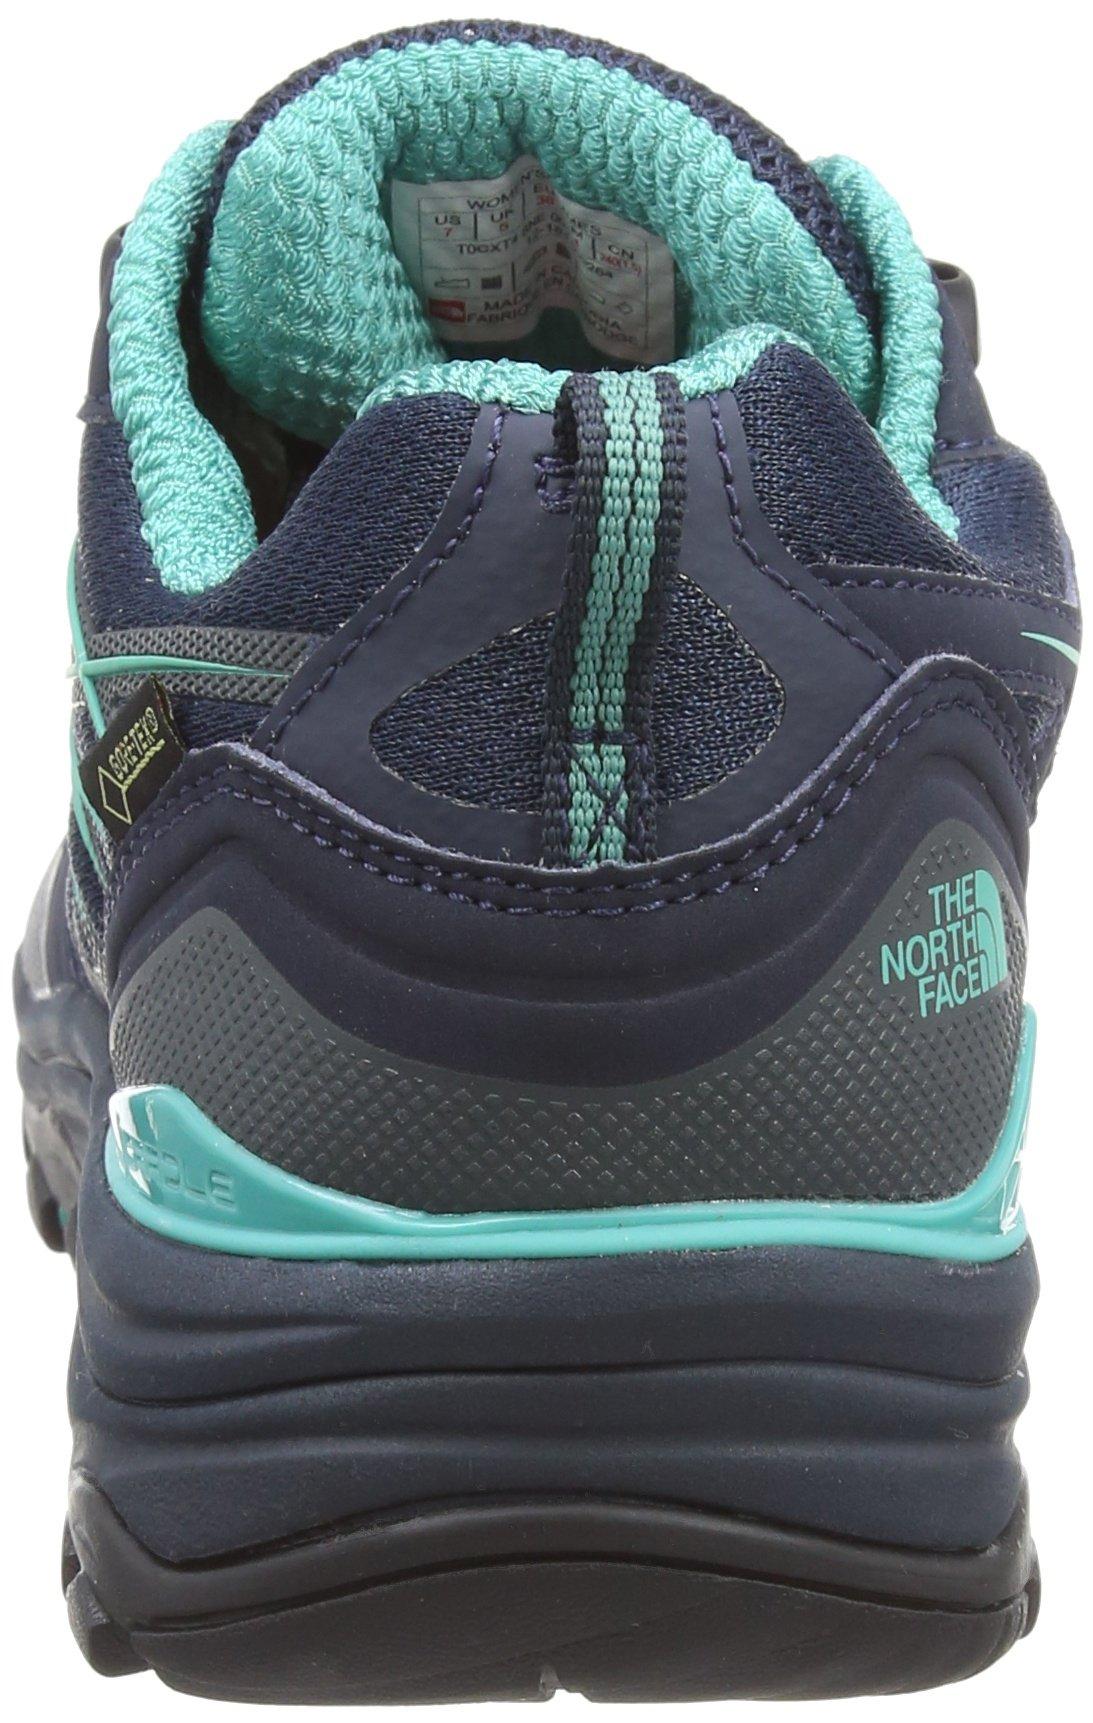 815ldsUWAyL - THE NORTH FACE Women's Hedgehog Fastpack Gore-tex (EU) Low Rise Hiking Boots